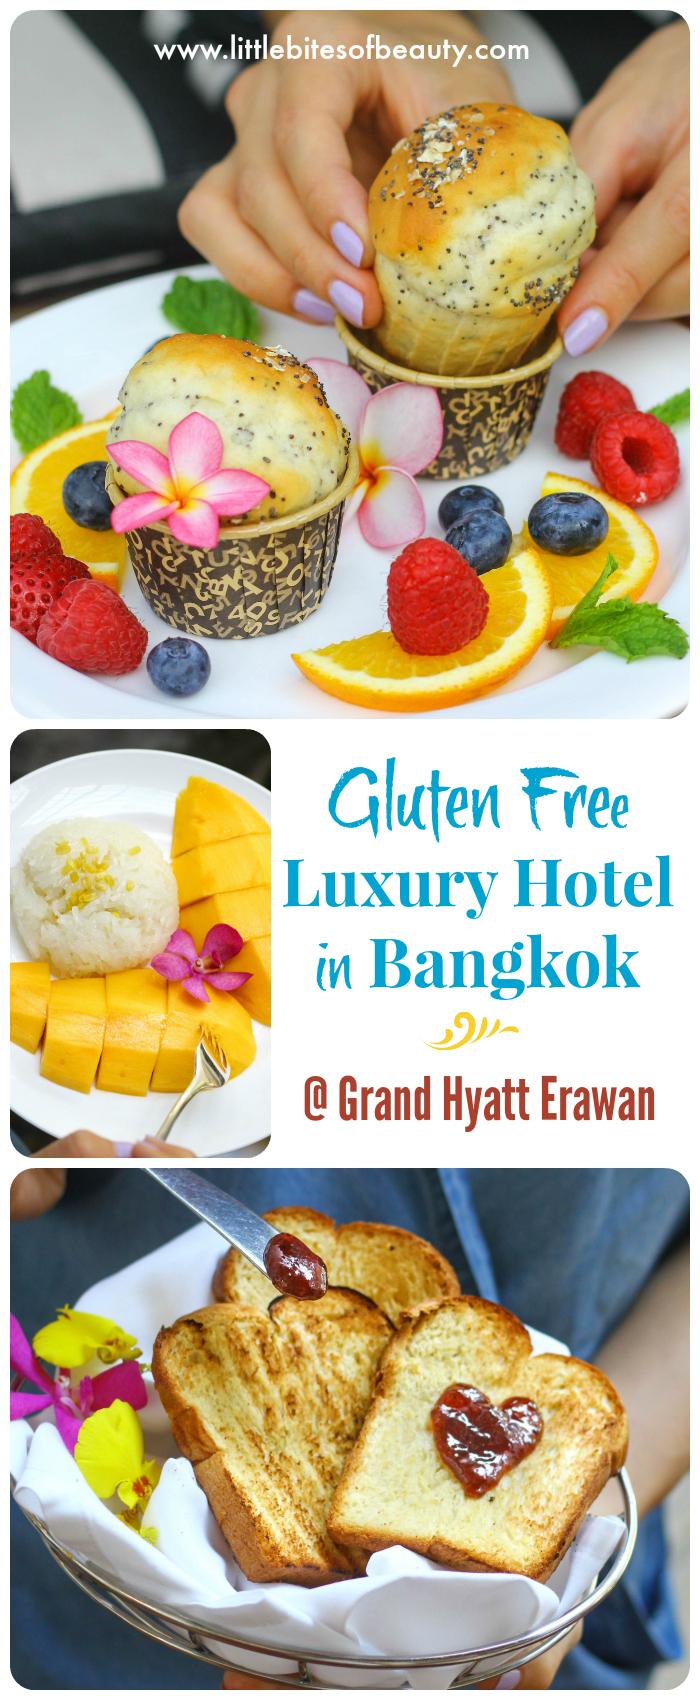 Gluten Free Luxury Hotel in Bangkok. Grand Hyatt Erawan